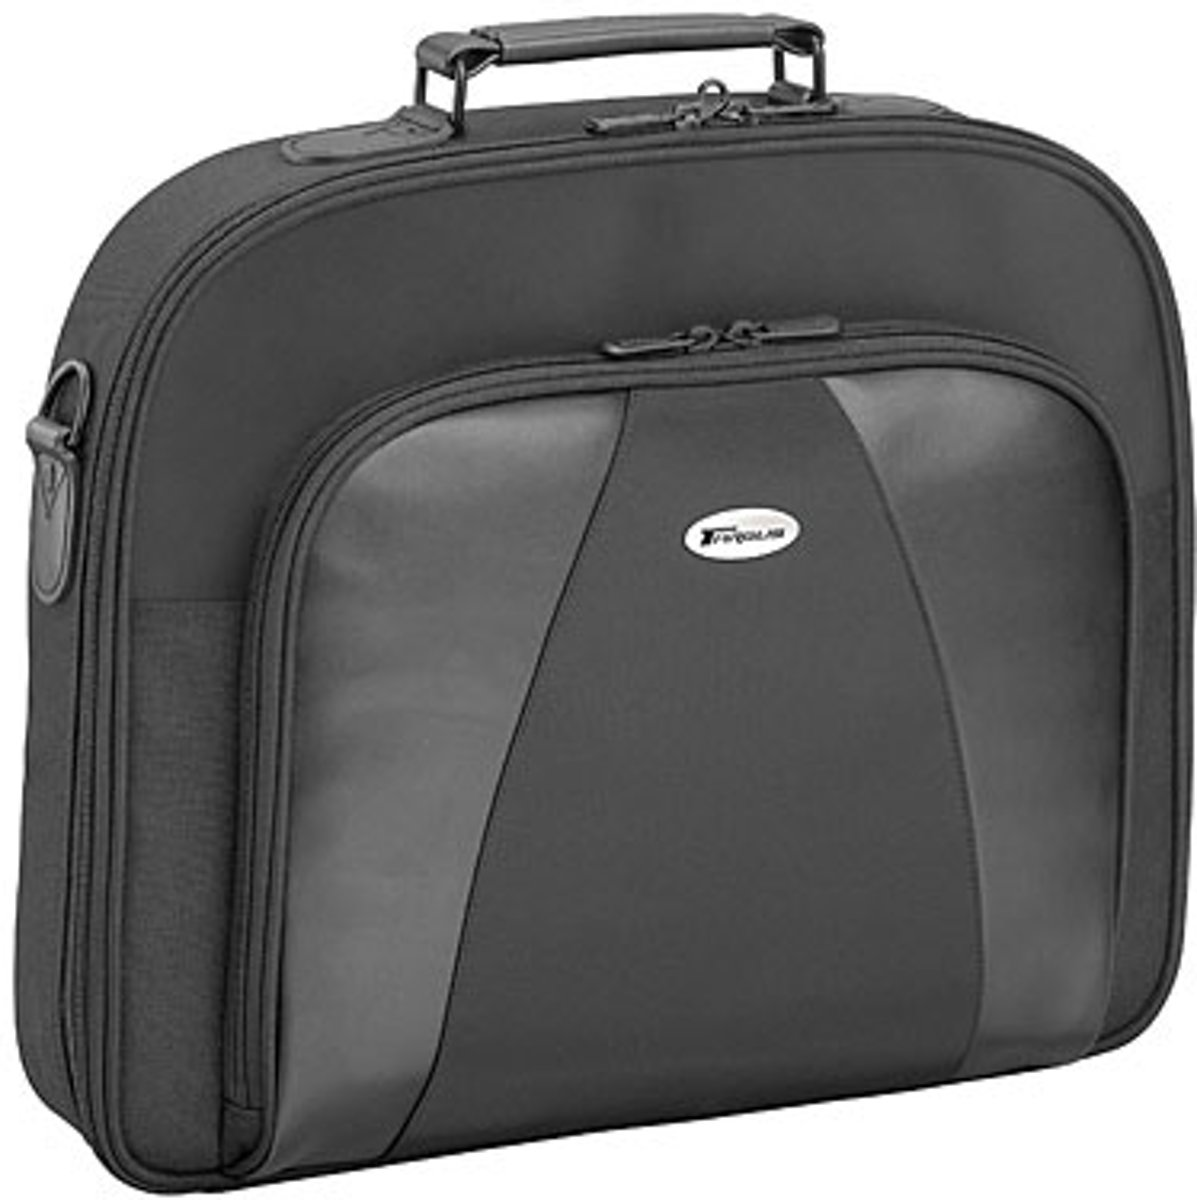 036835c3b13 bol.com   Targus Deluxe Notebook Case (CN32 ) - 15.4 Inch